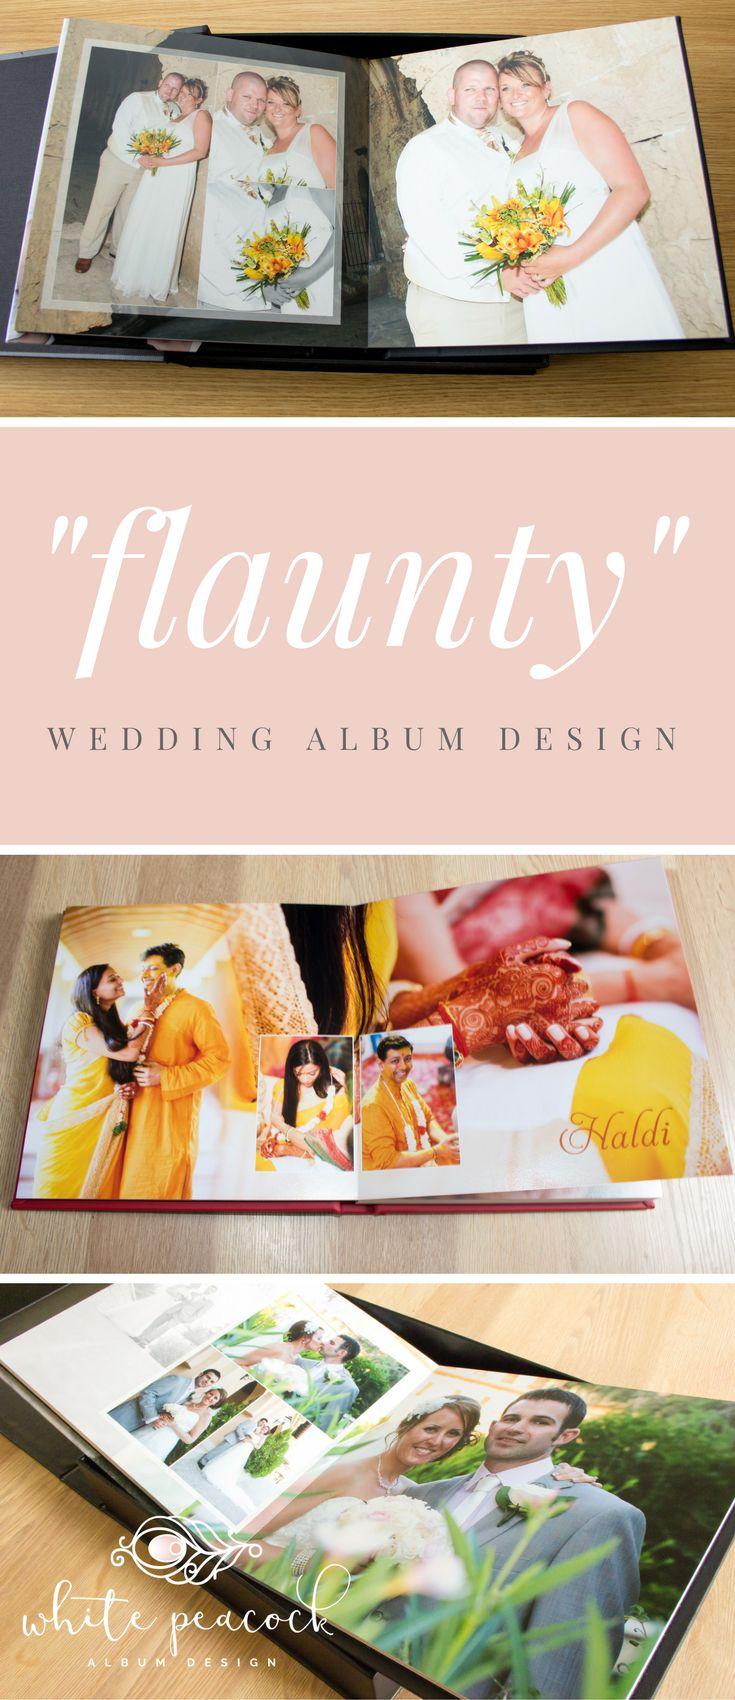 23 best Bespoke Wedding Album Design by White Peacock images on